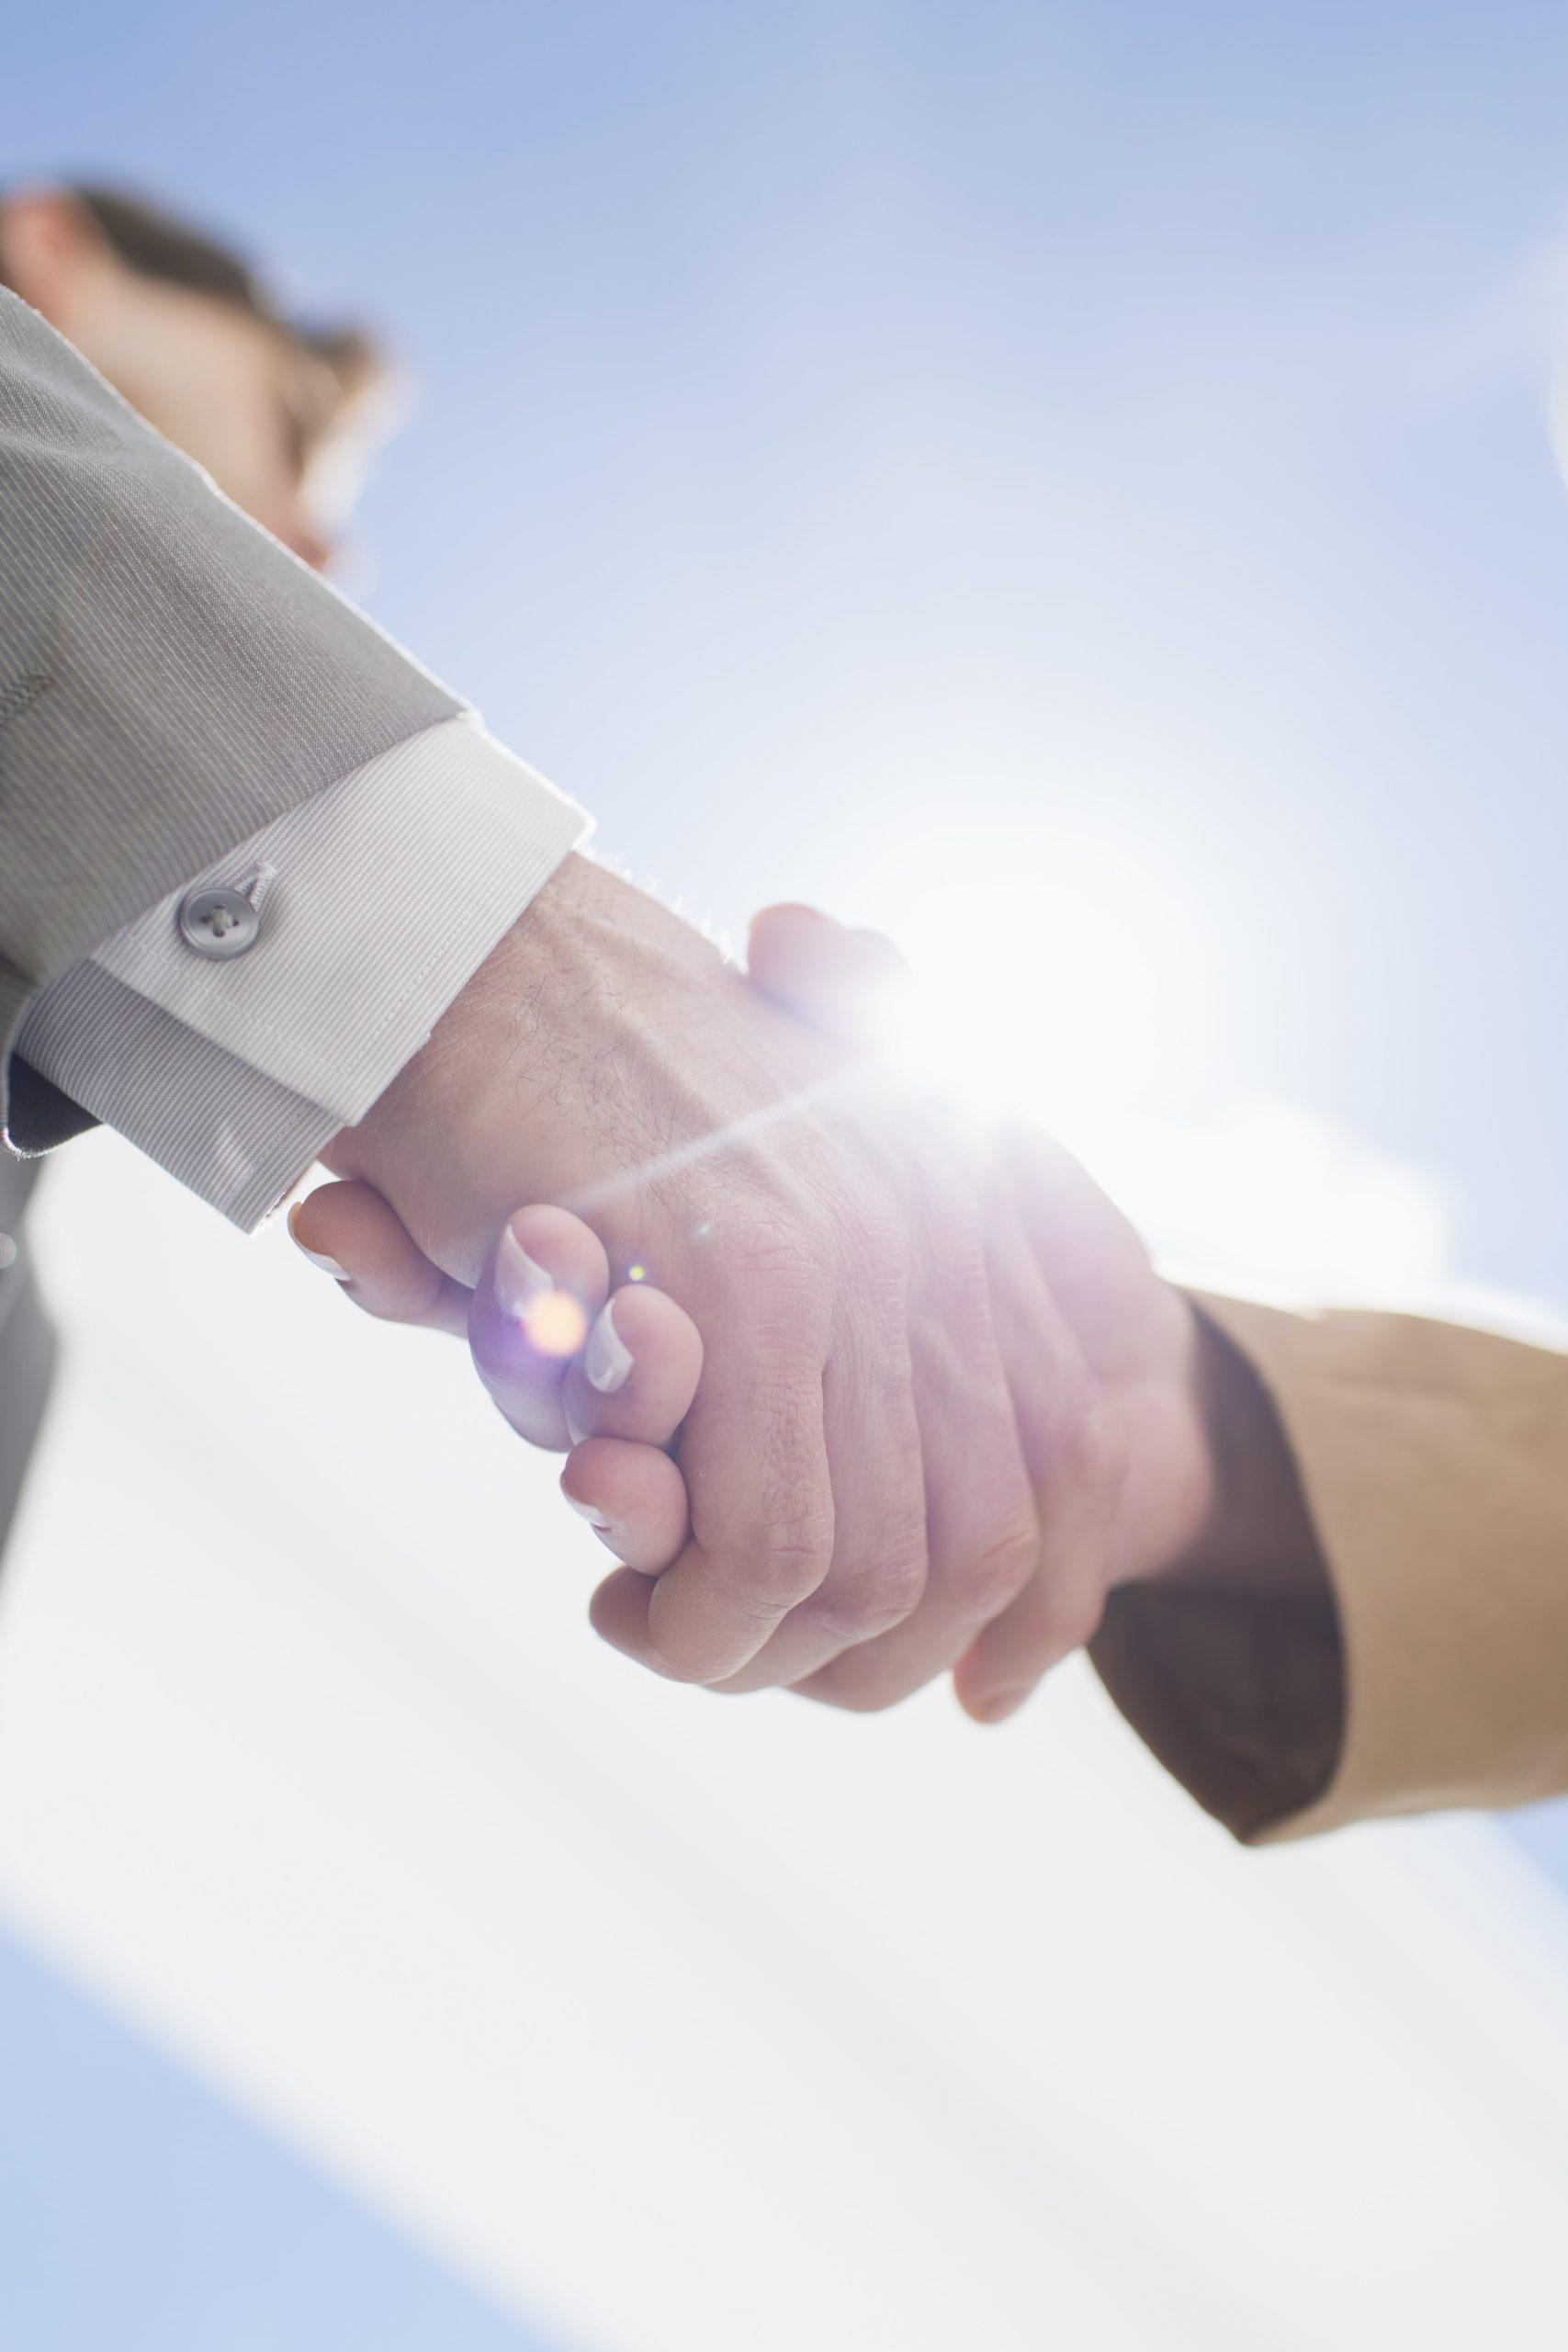 Simpson Associates earns Analytics on Microsoft Azure Advanced Specialization